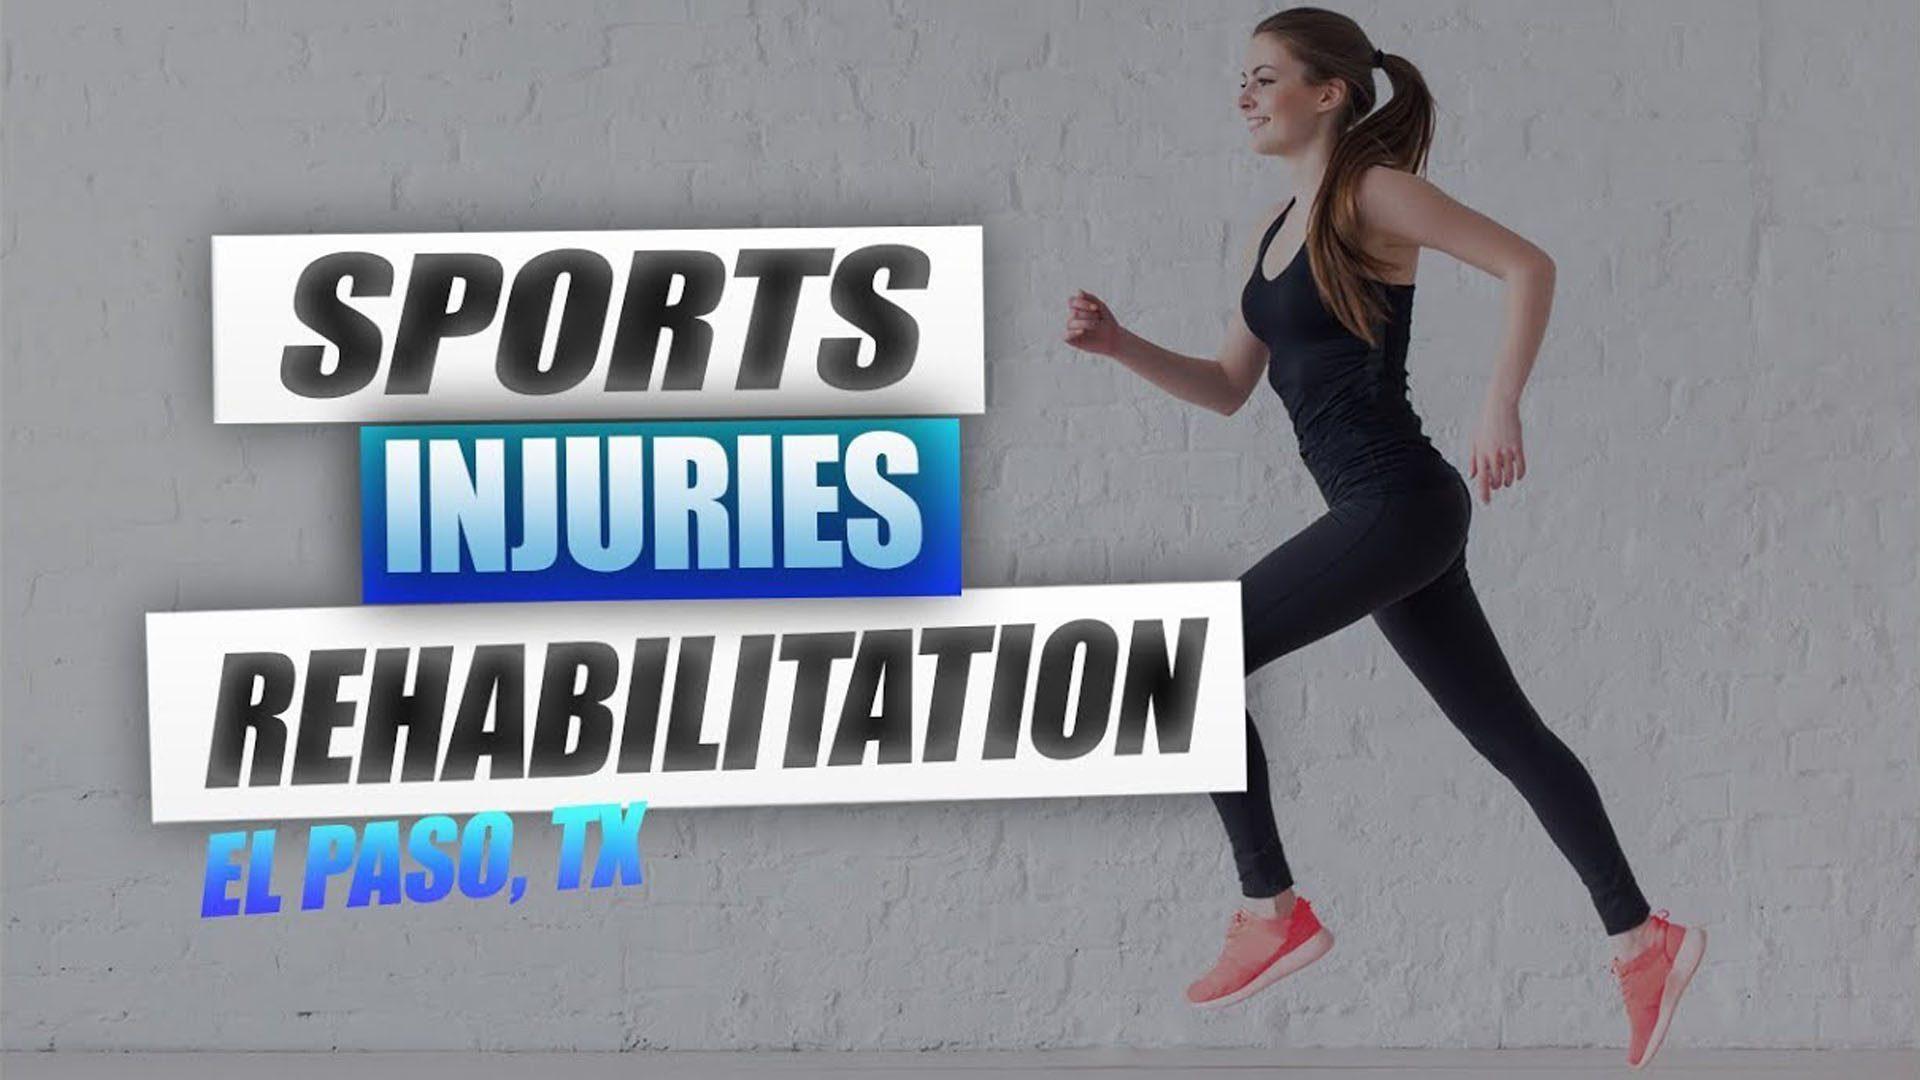 sports injuries rehabilitation el paso tx.